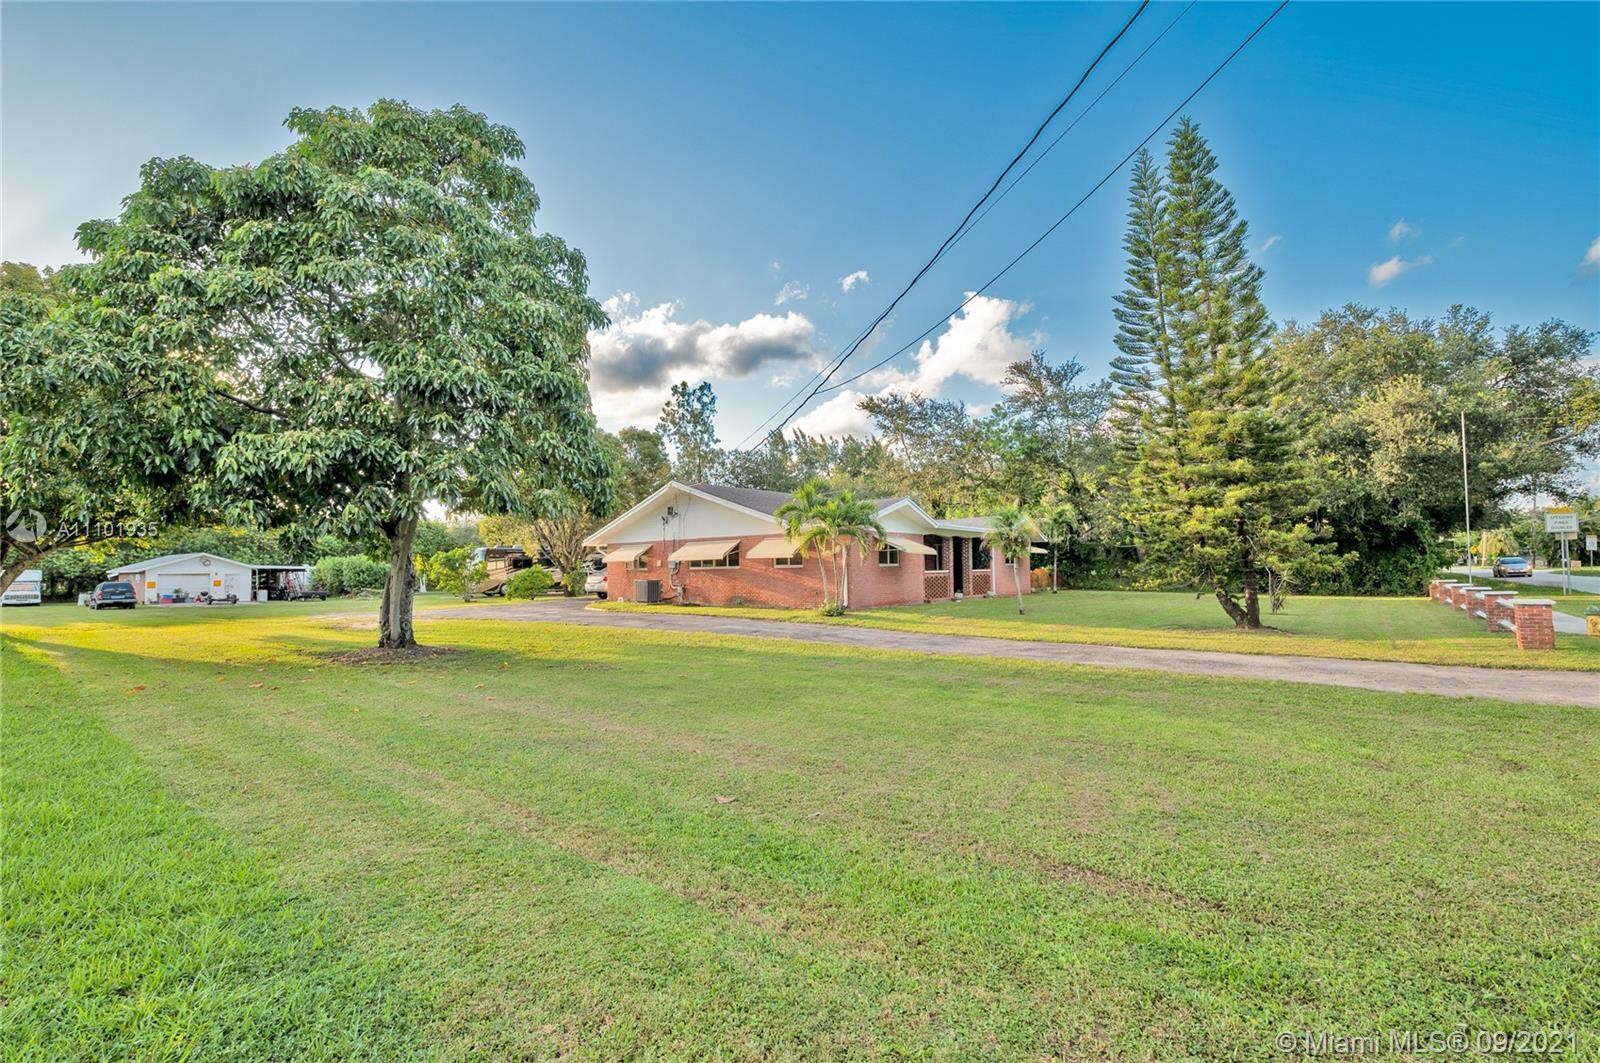 Photo of 4765 SW 61st Ave, Davie, FL 33314 (MLS # A11101935)